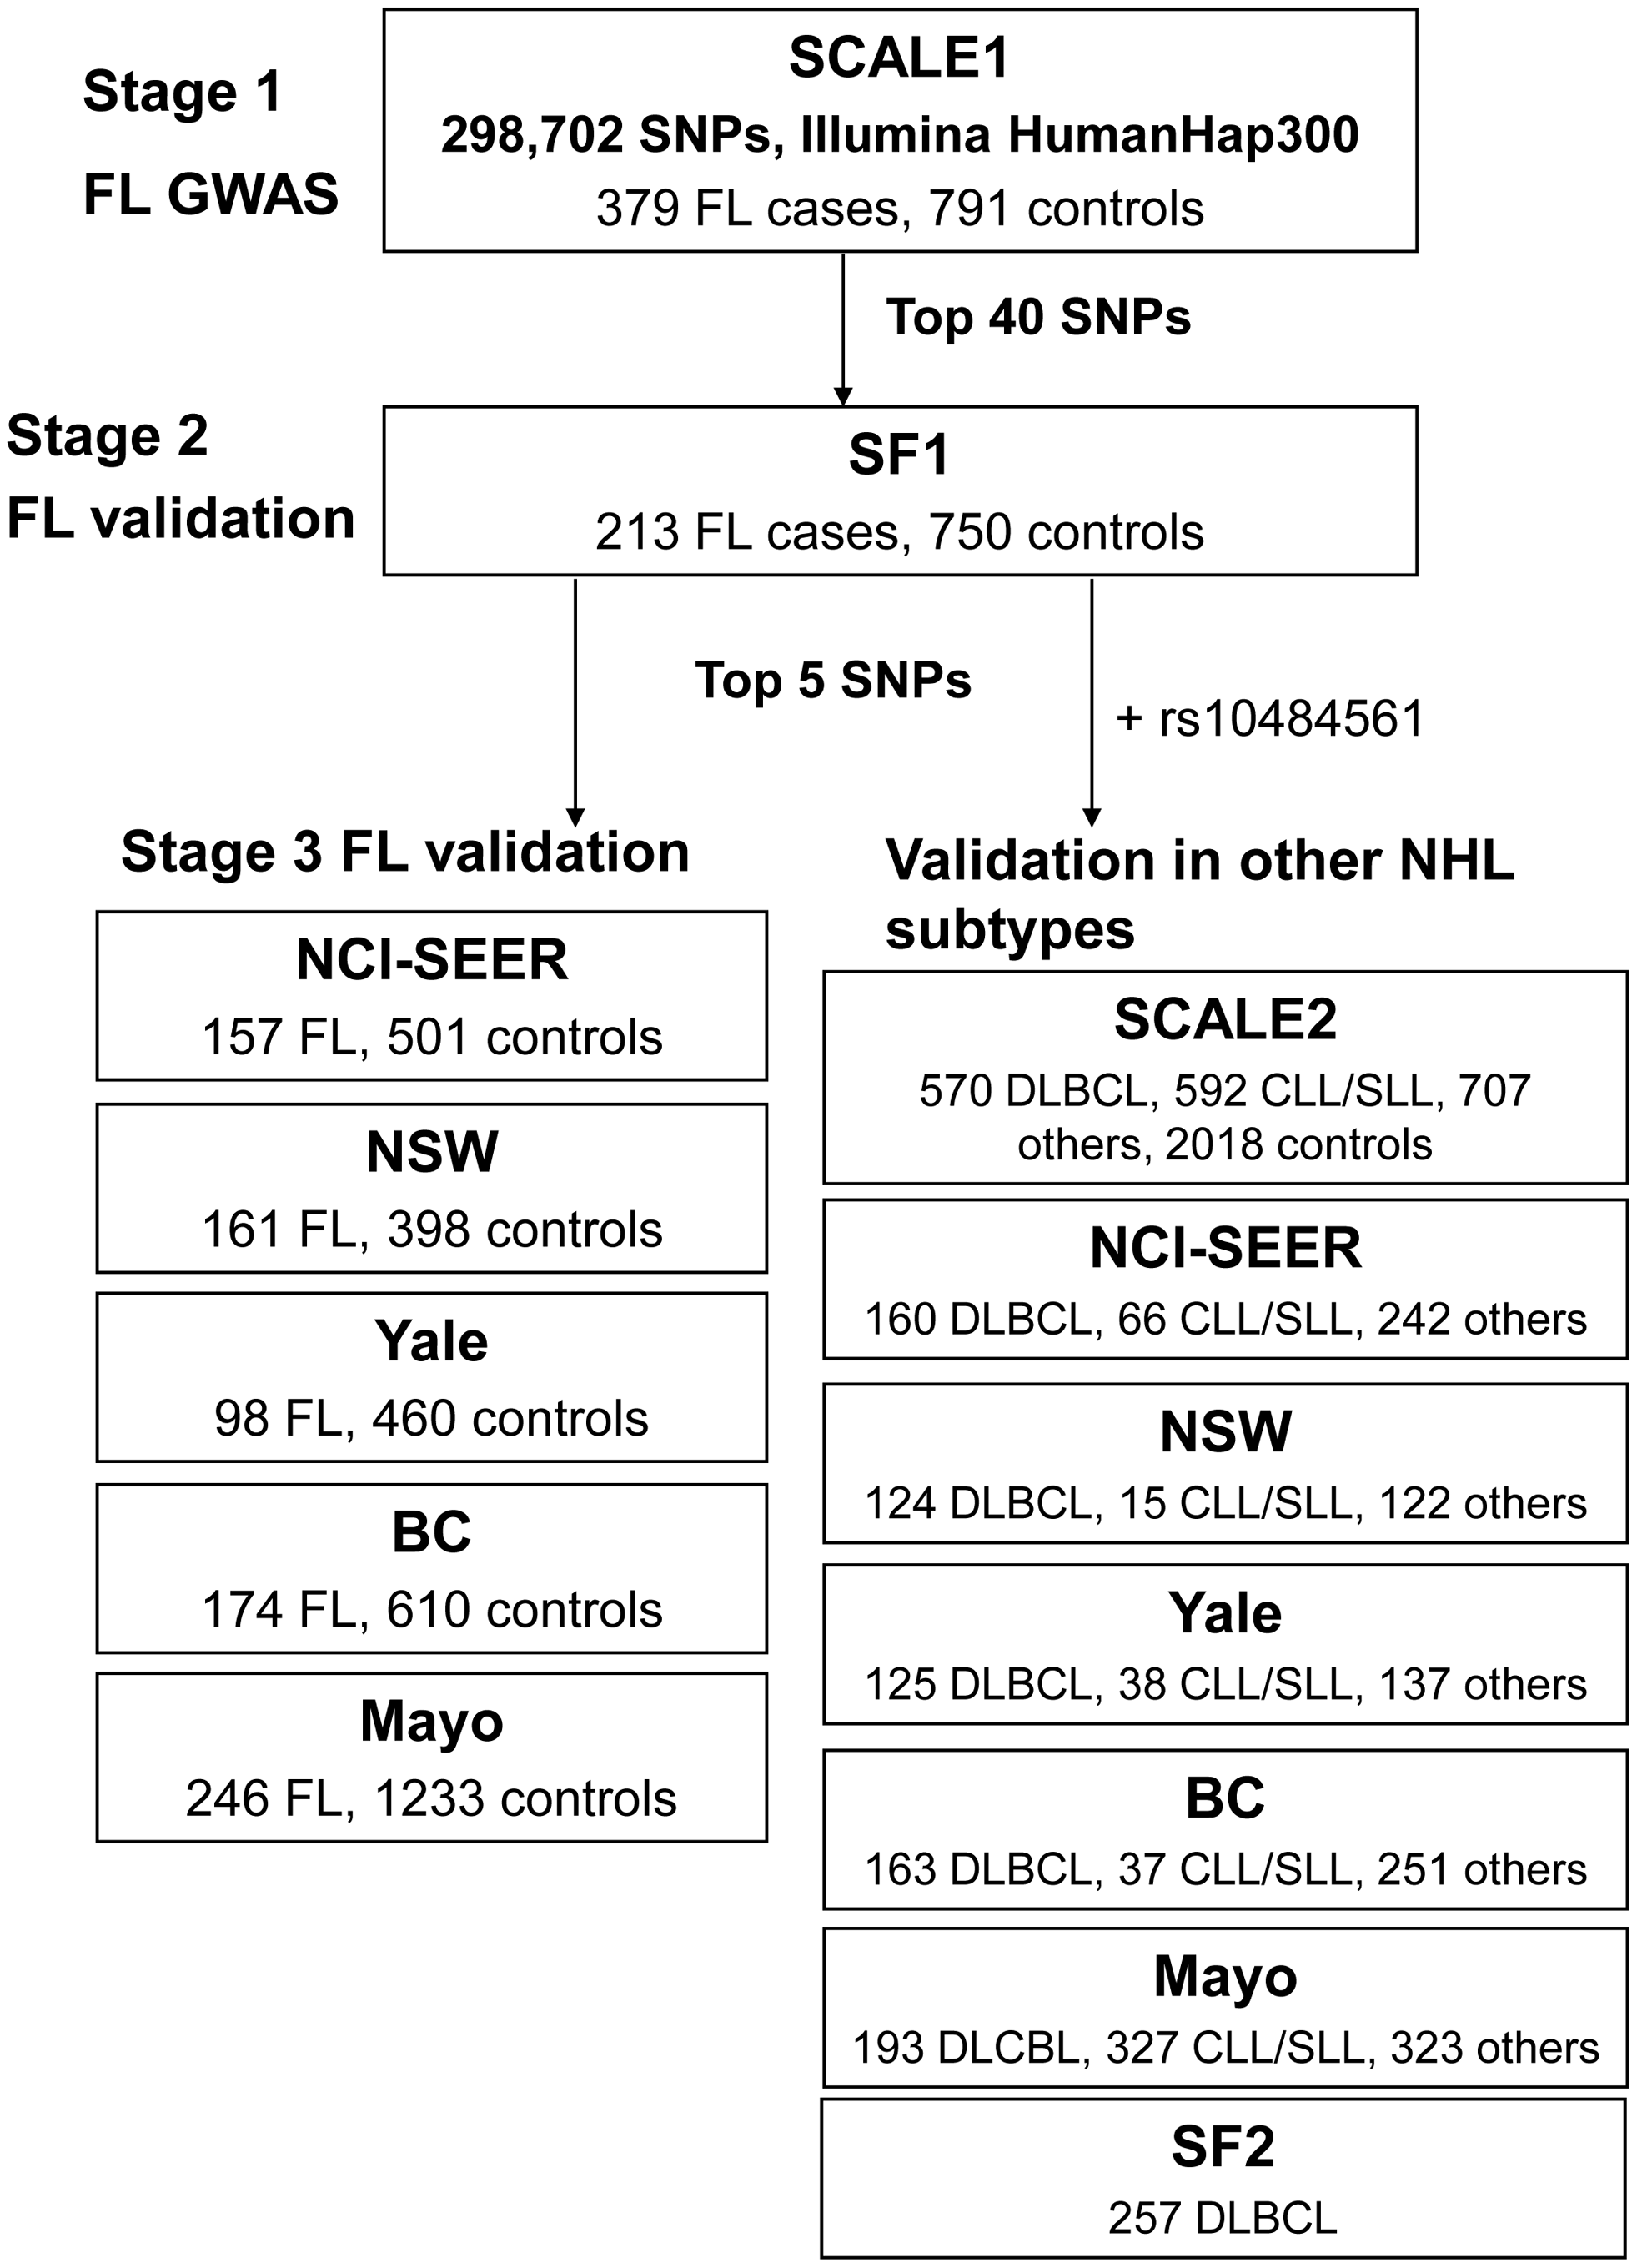 Schematic representation of the three-stage study design.